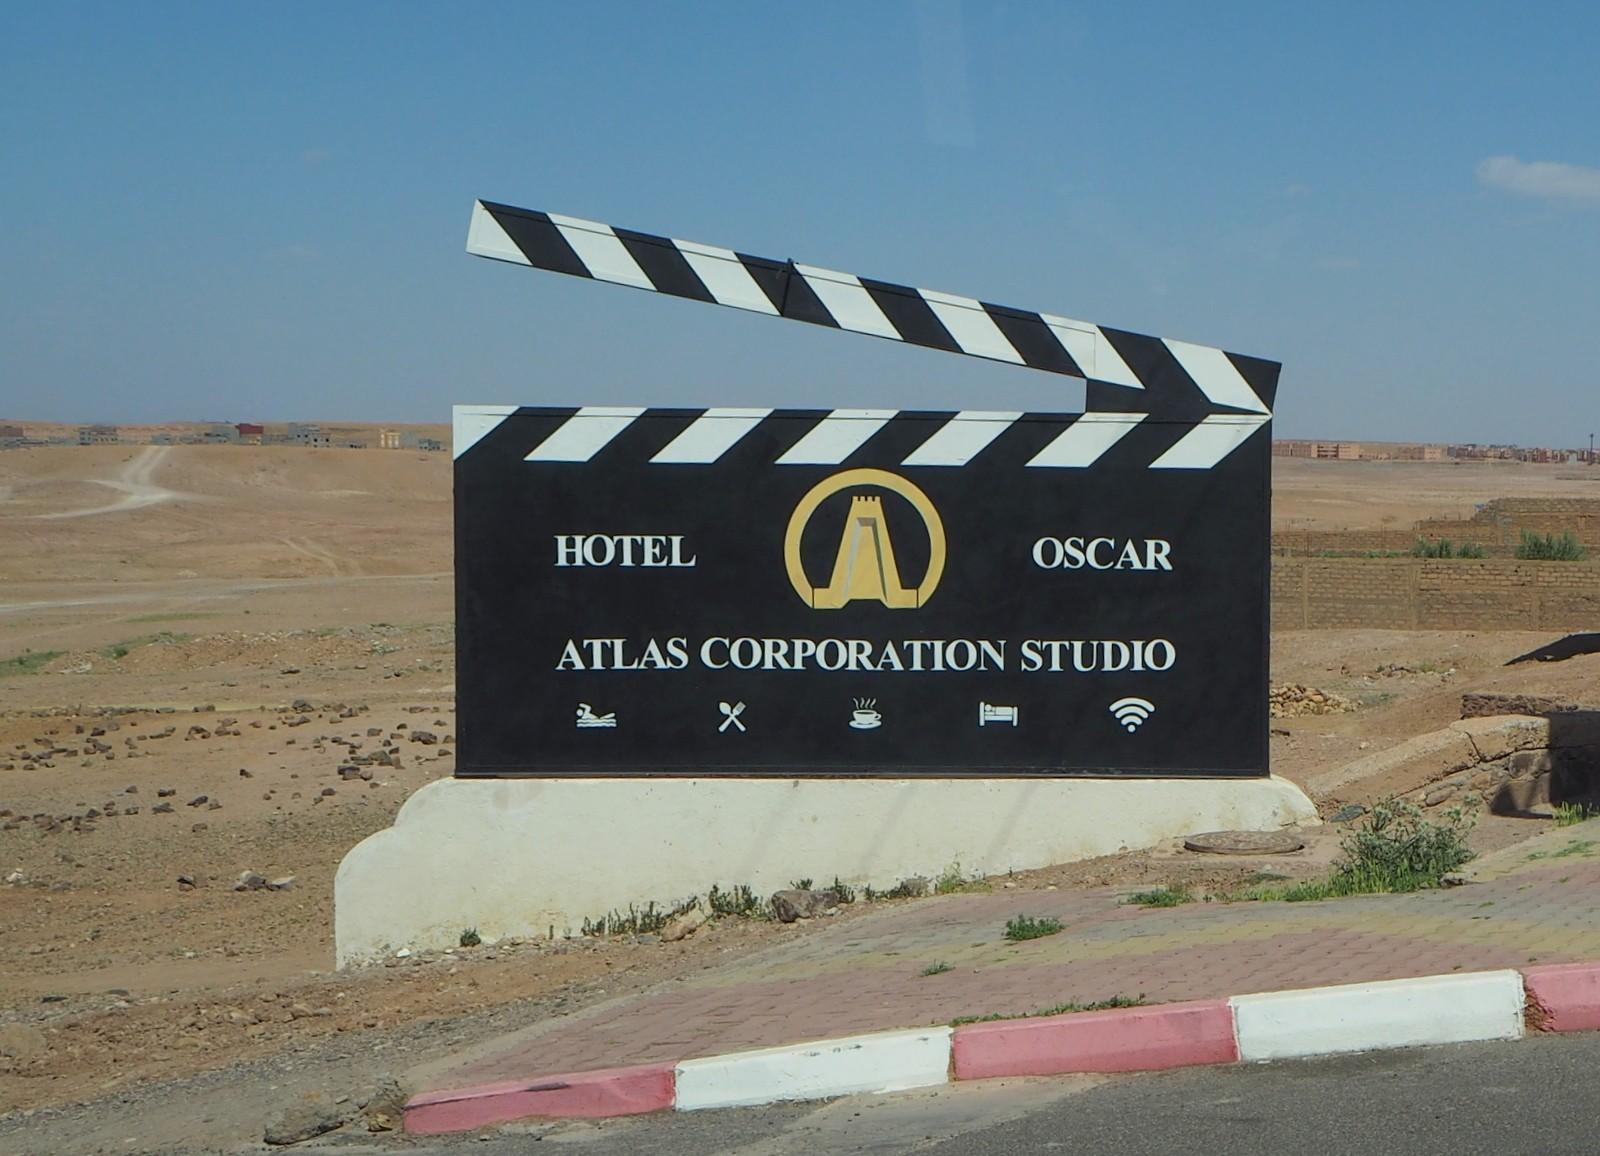 Ourazazate Morocco